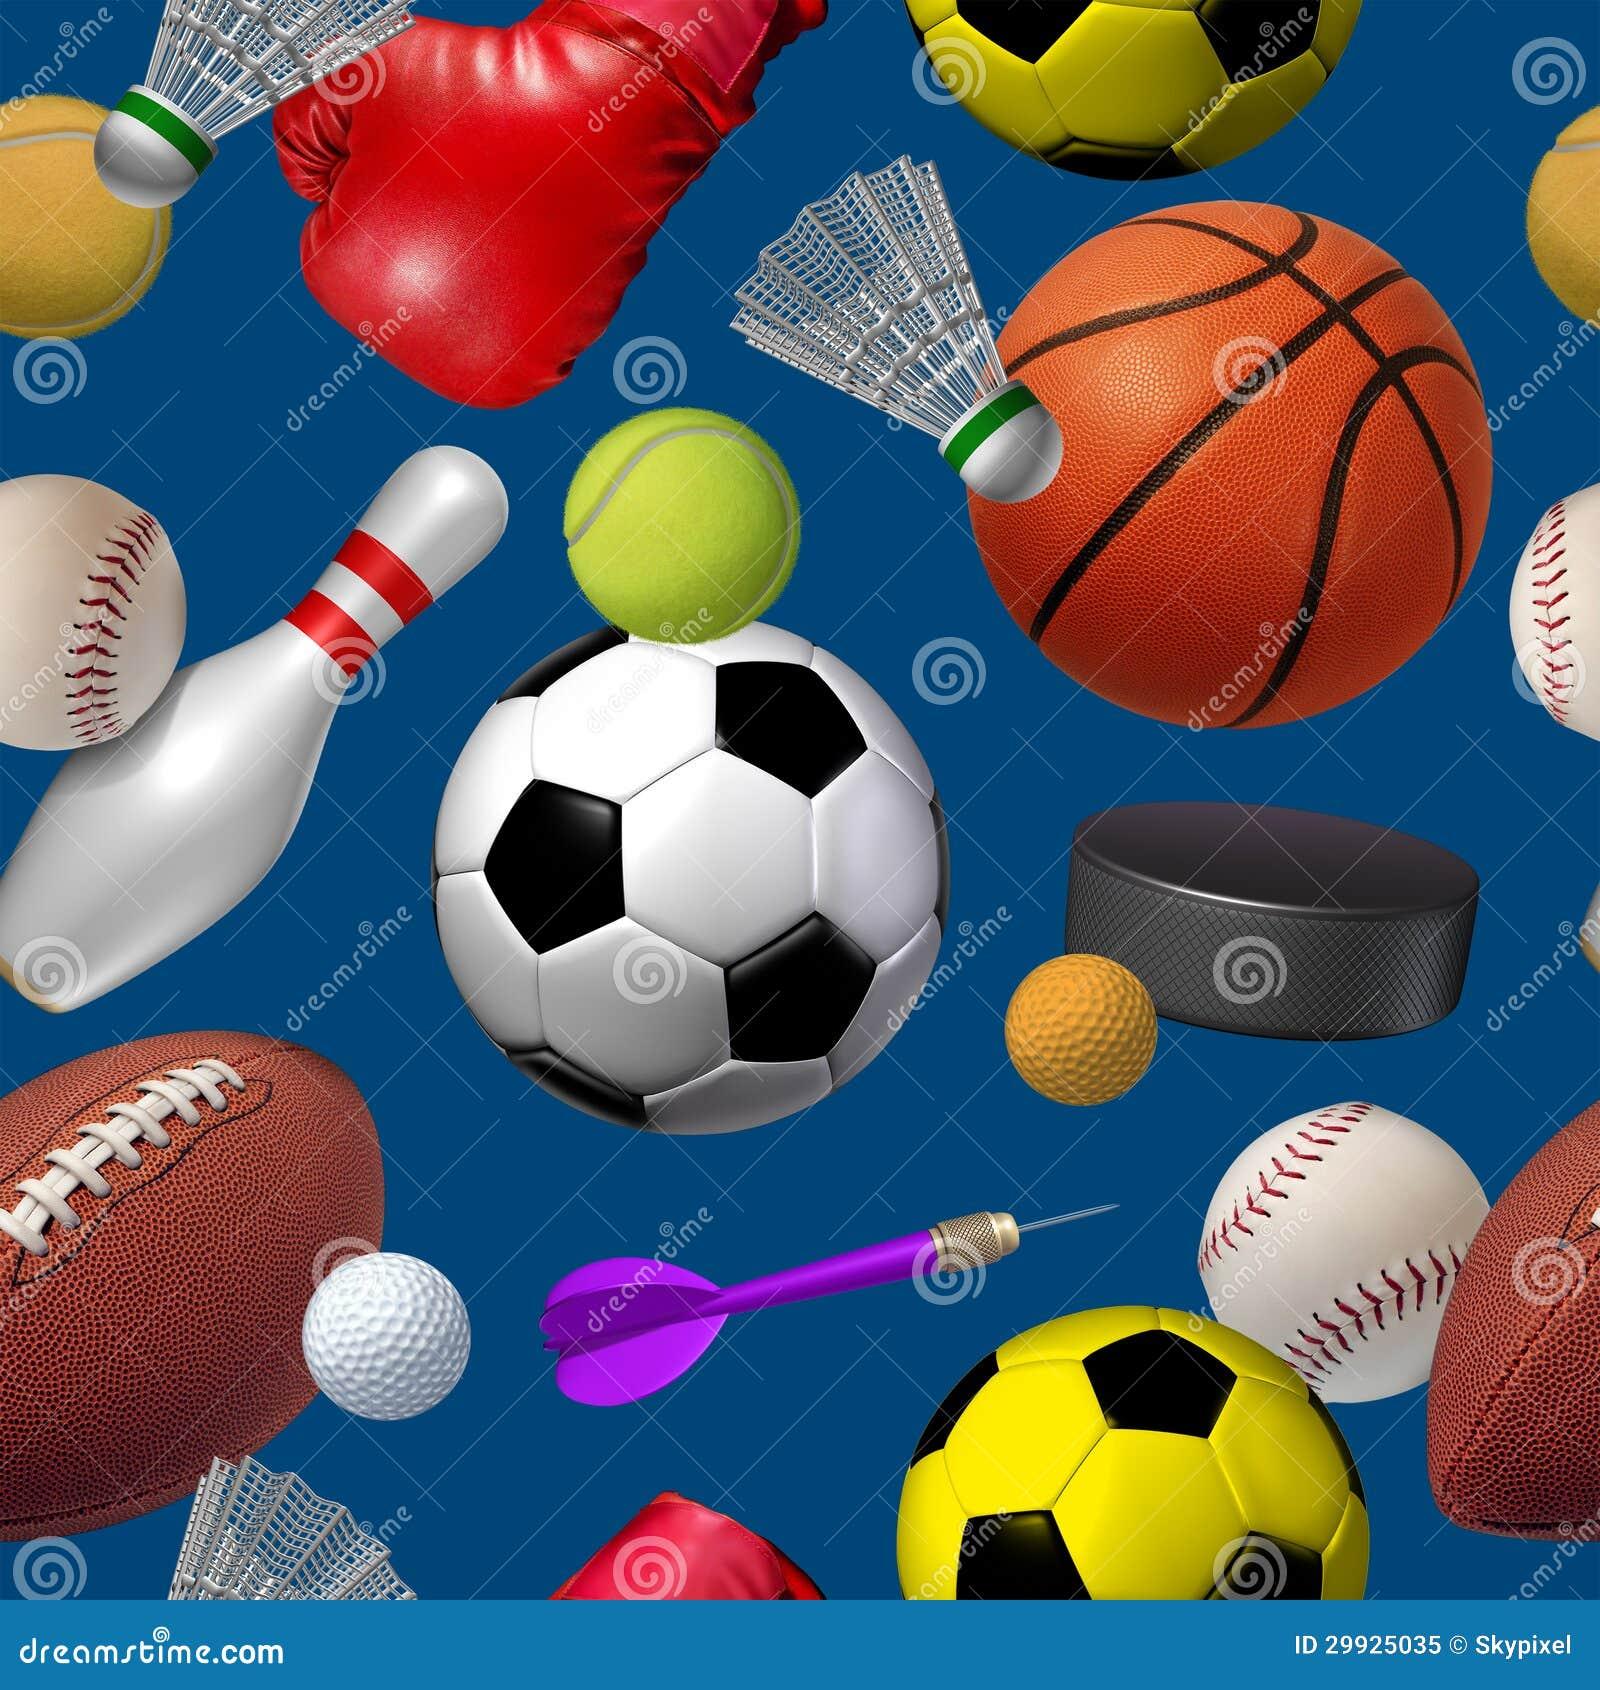 sports background designs - photo #31